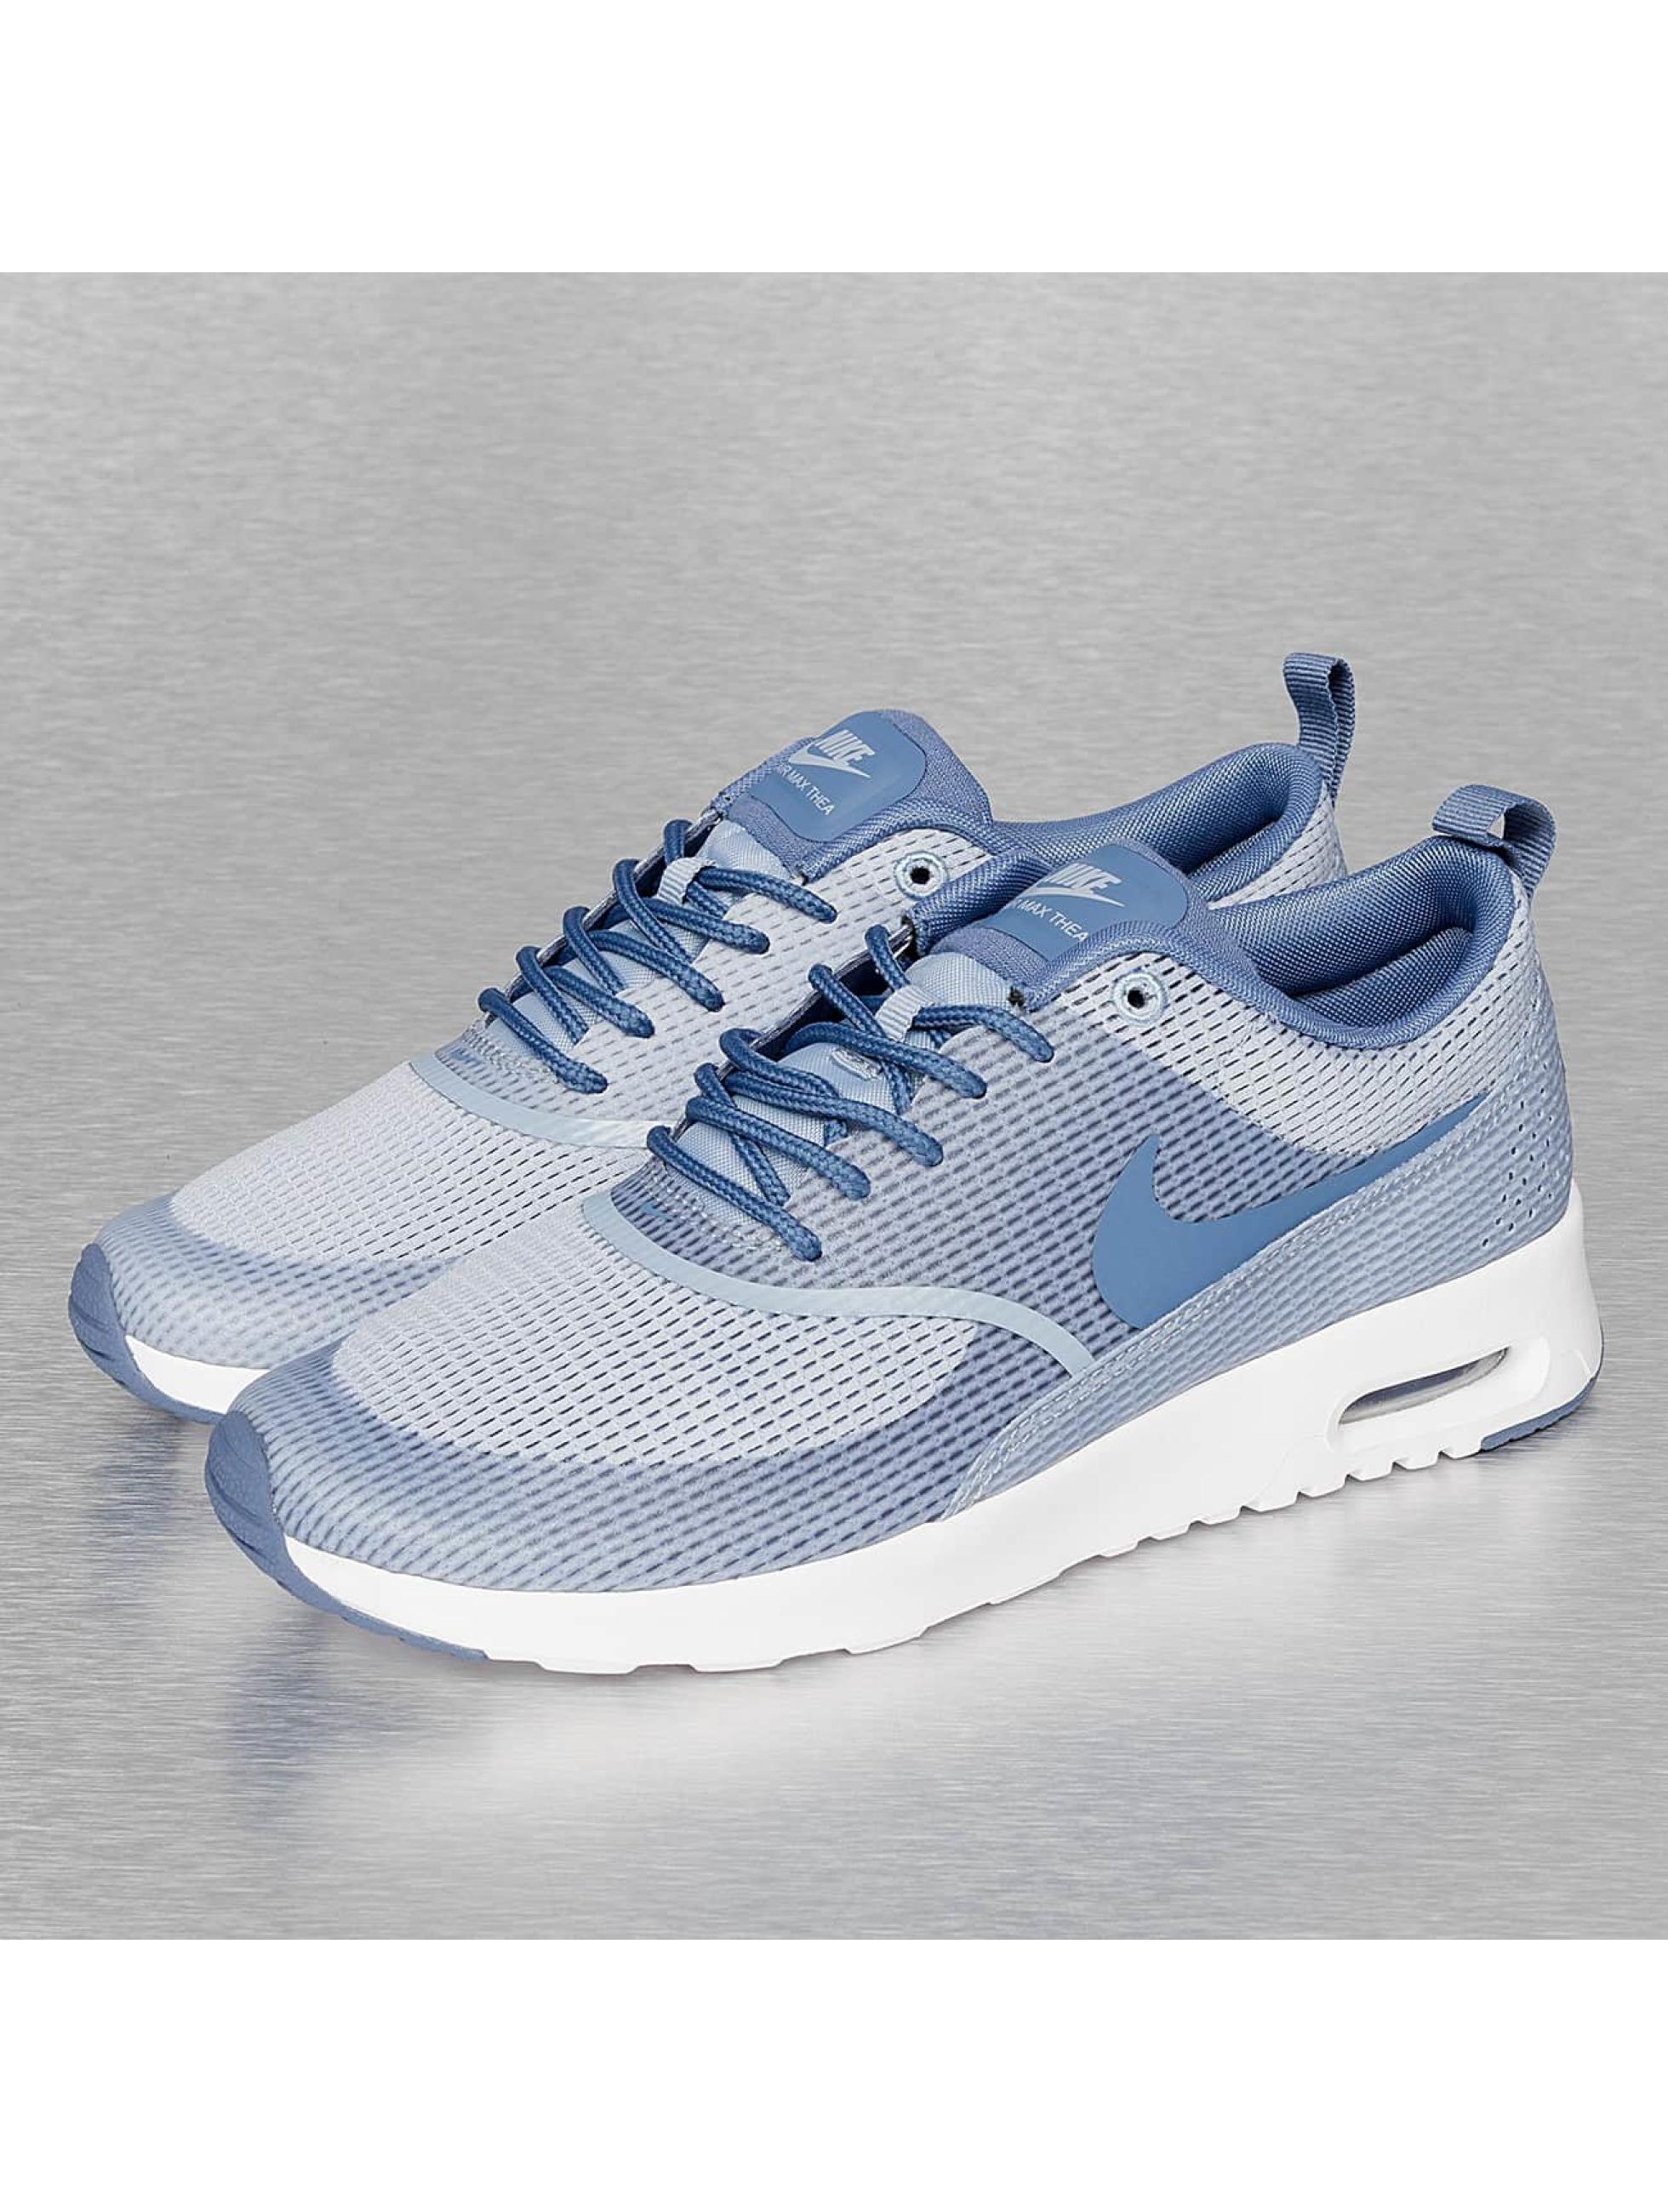 nike sneaker air max thea textile women 39 s in blau 218166. Black Bedroom Furniture Sets. Home Design Ideas